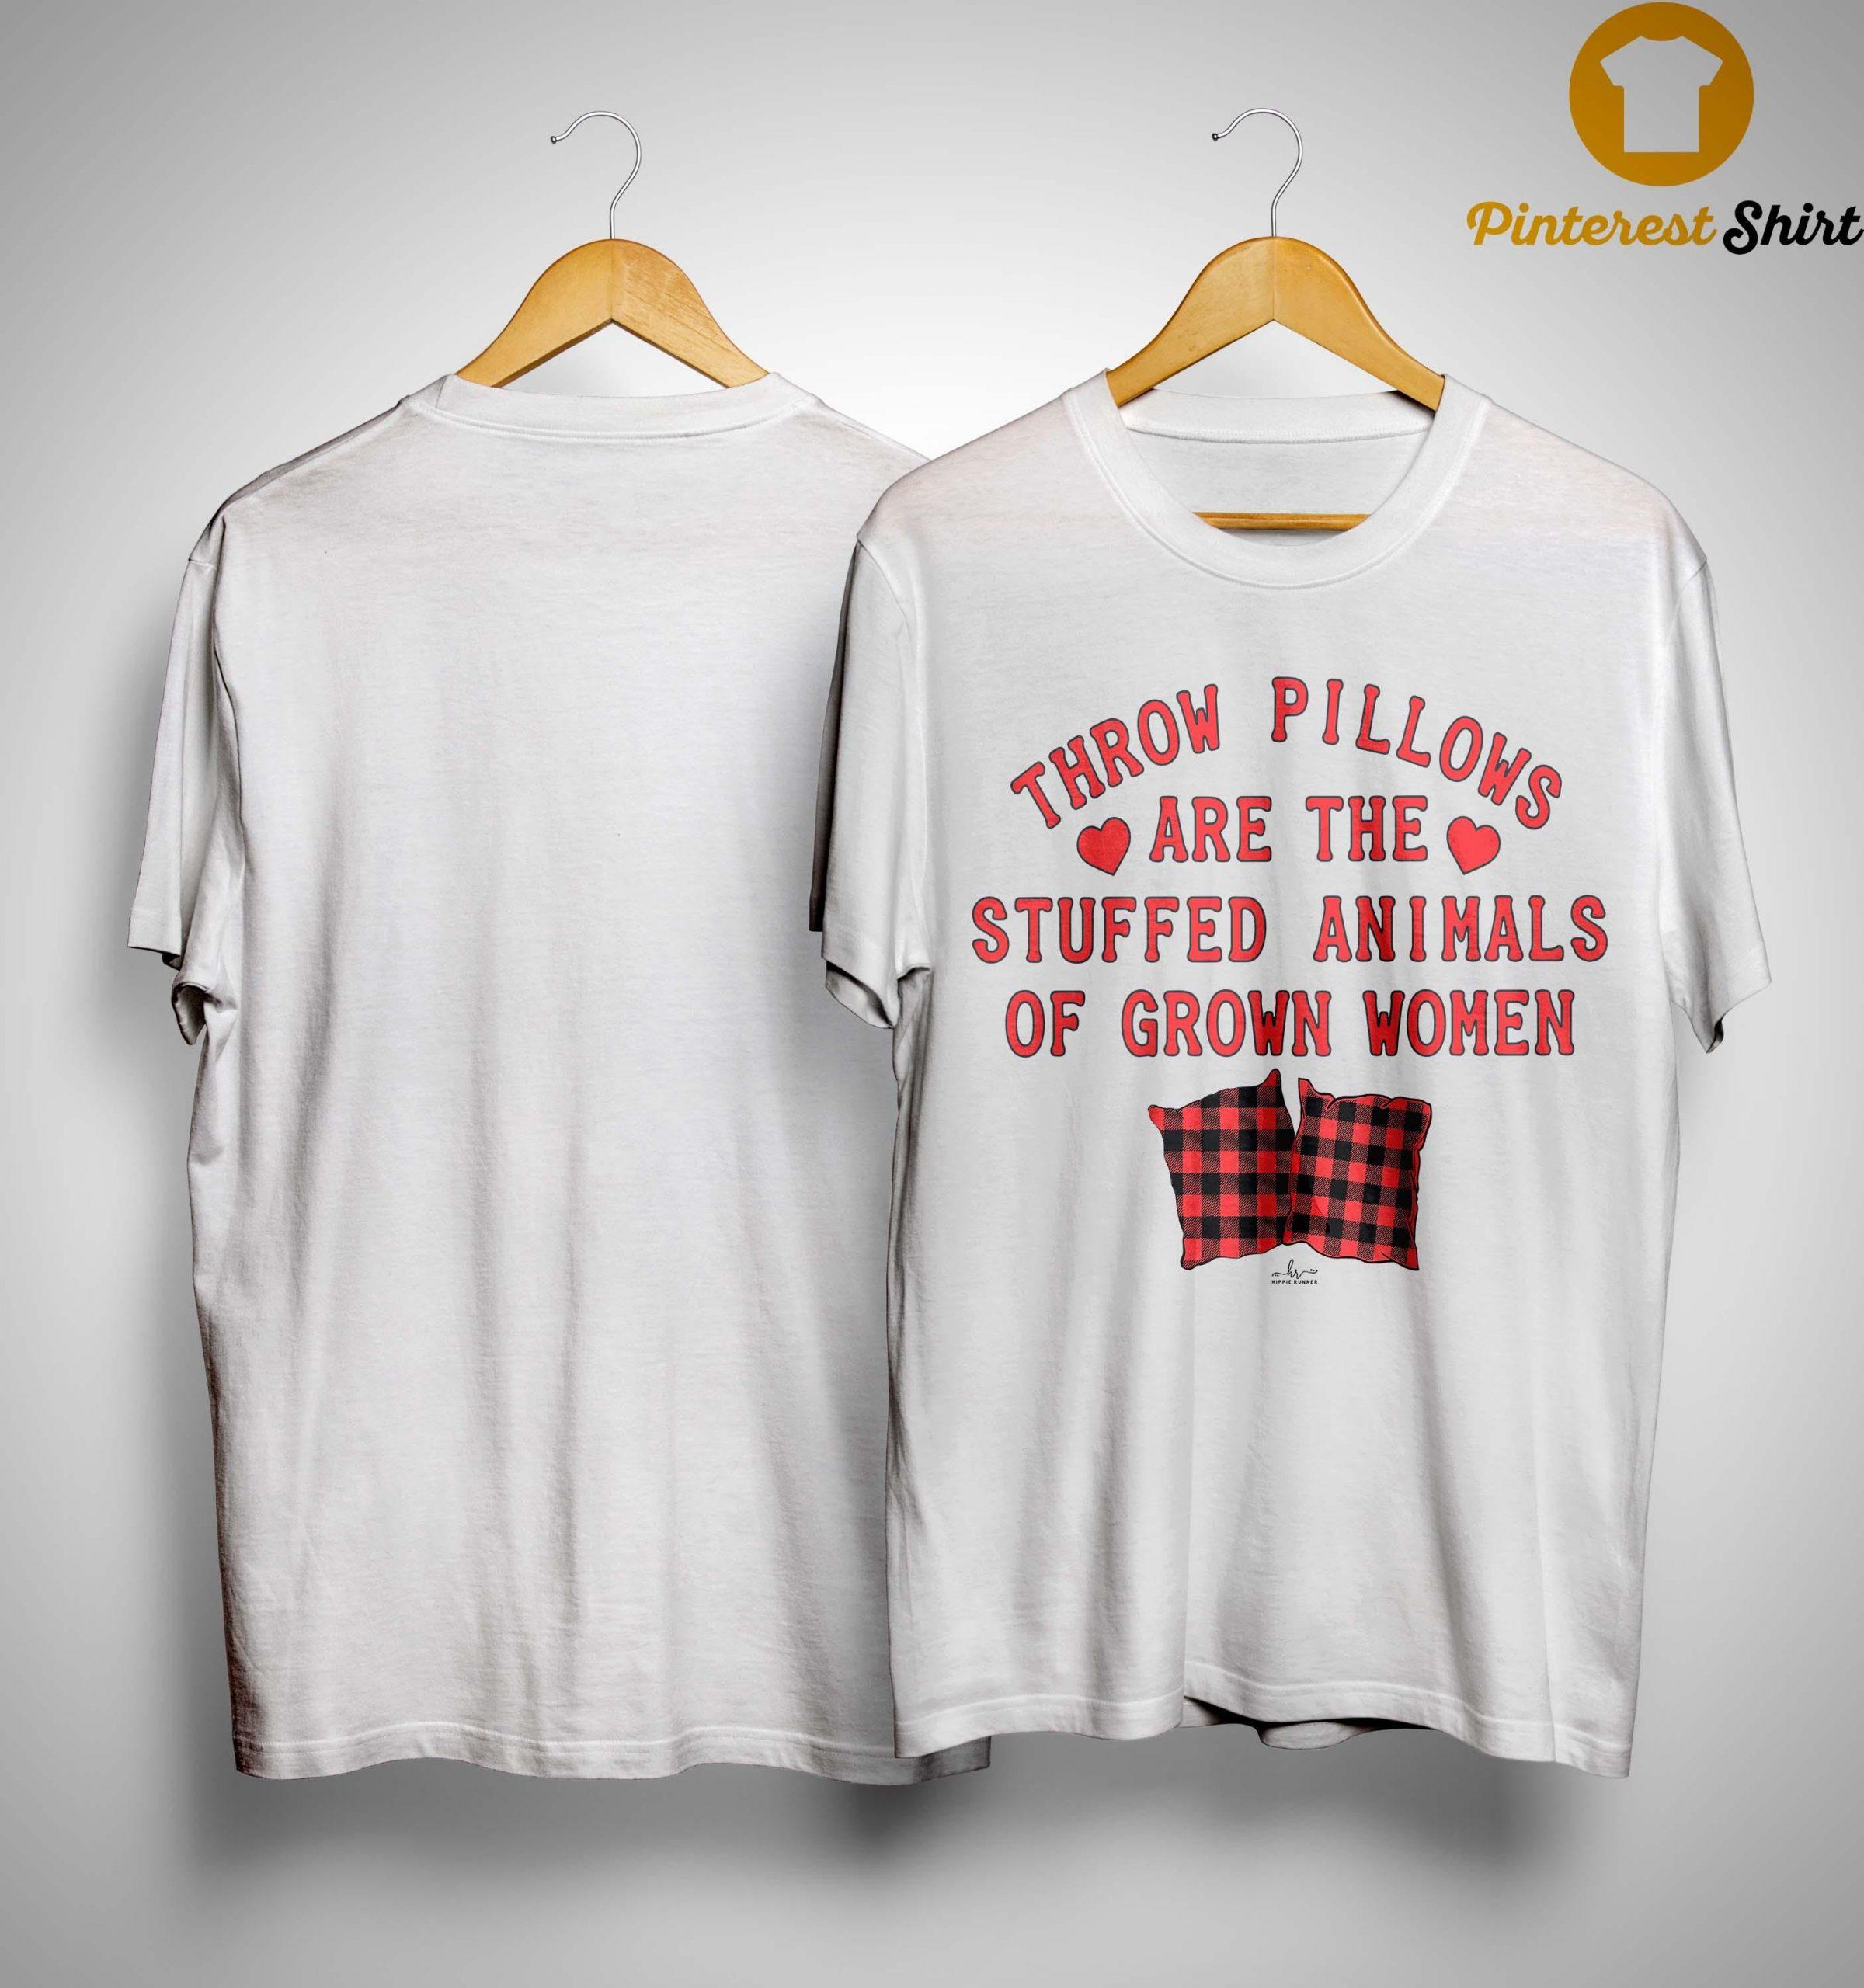 Throw Pillows Are The Stuffed Animals Of Grown Women Shirt